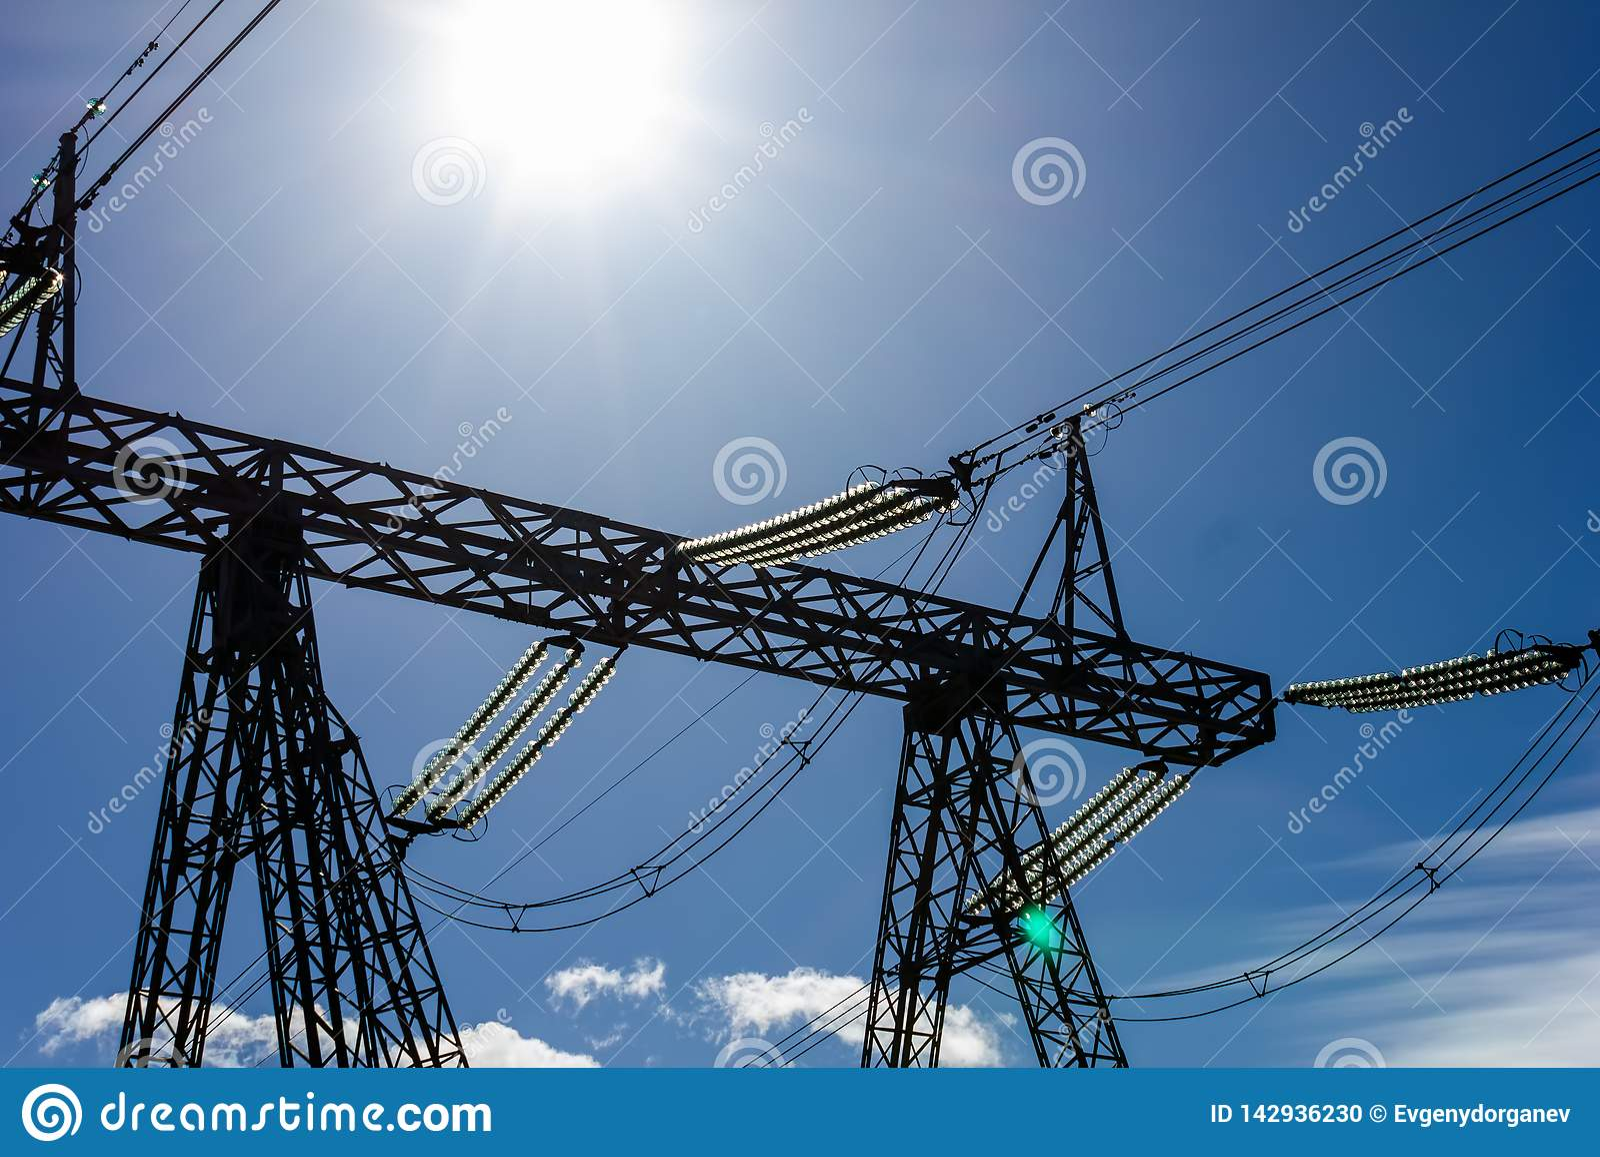 High voltage line high contrast